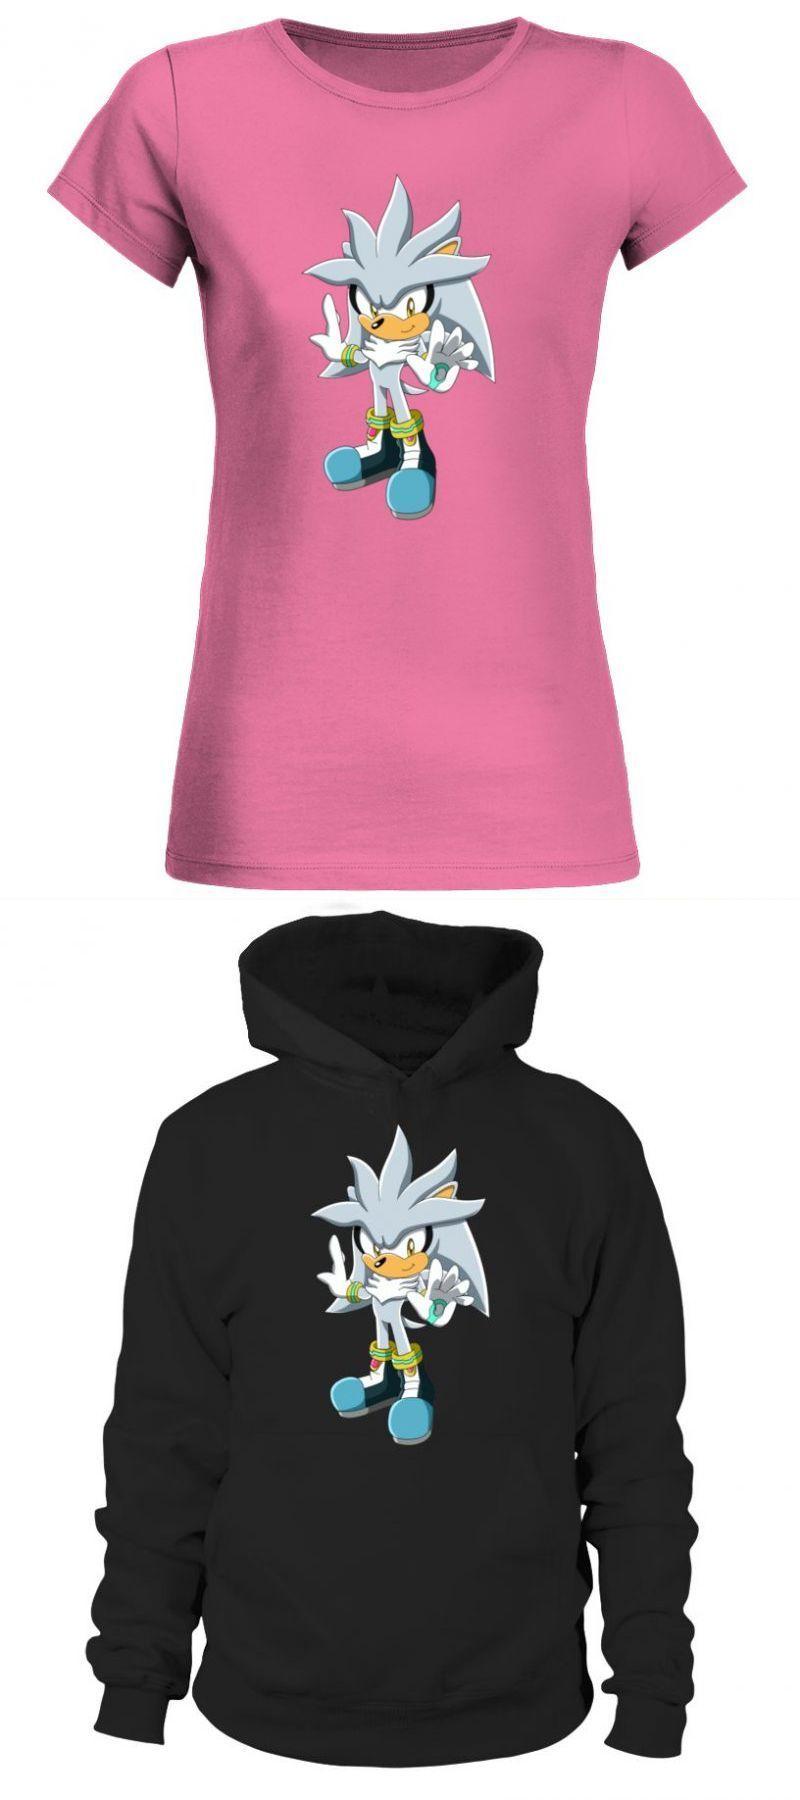 Sonic Hedgehog T Shirt Adults Sonic The Hedgehog Silver The Hed Sonic The Hedgehog T Shirt Womens Shirts Shirts Unisex Sweatshirt